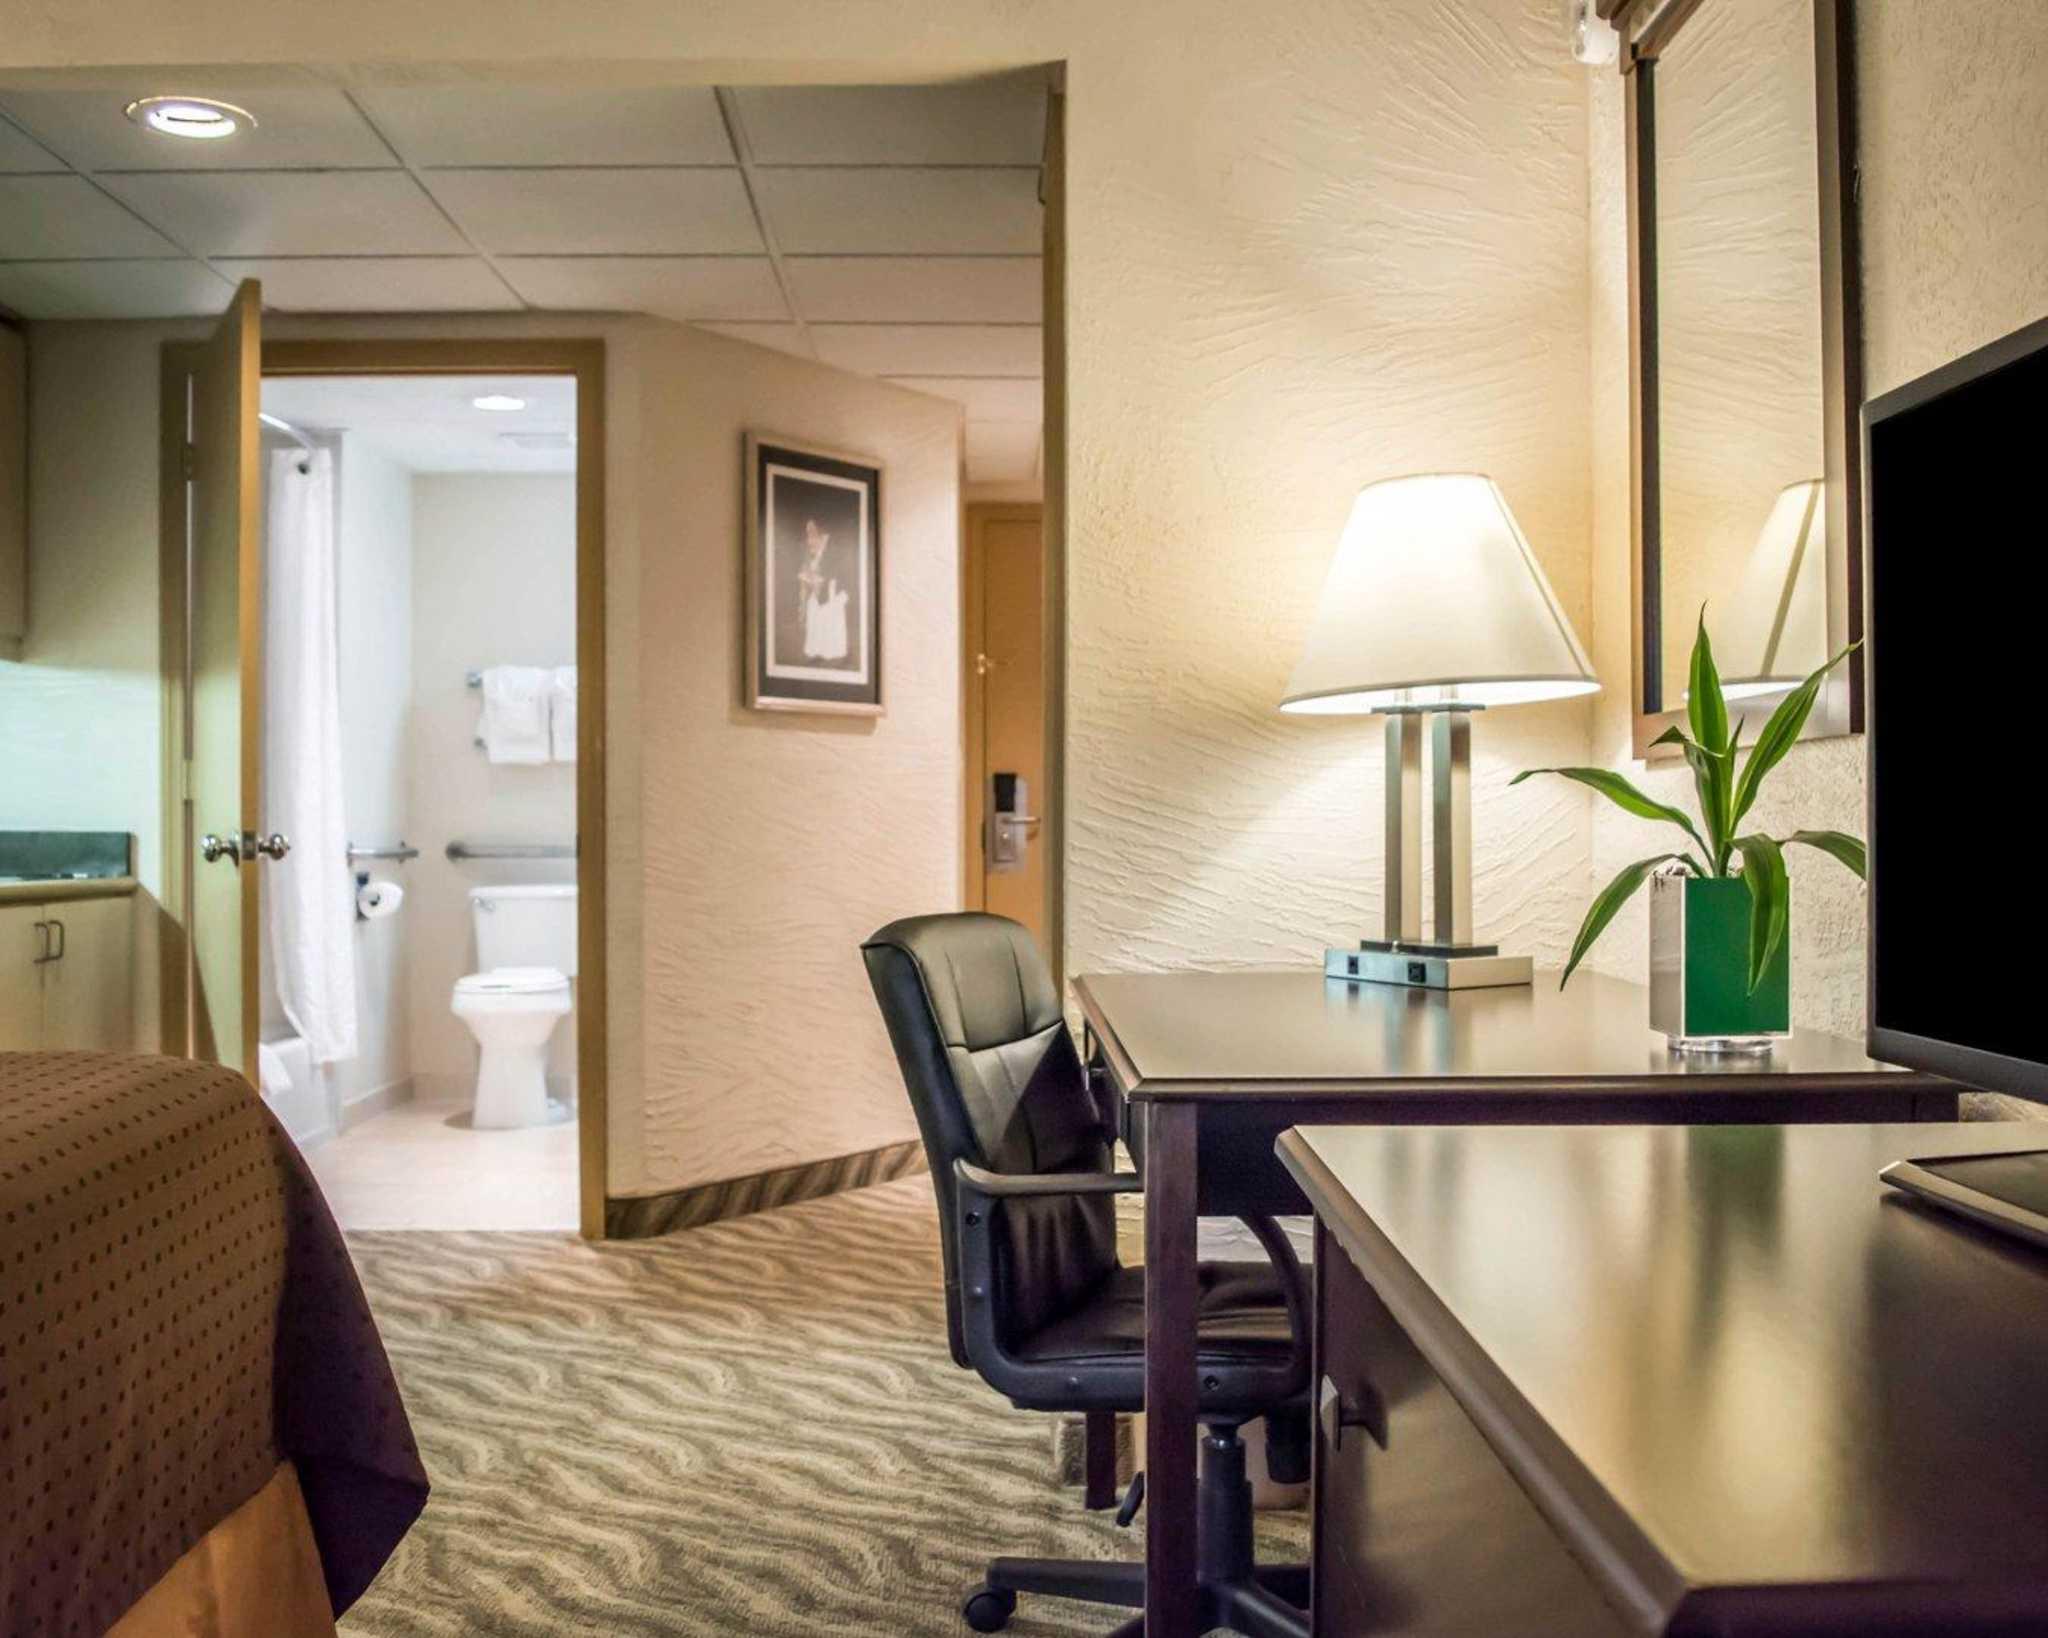 Hotel Suites Near Brandon Florida